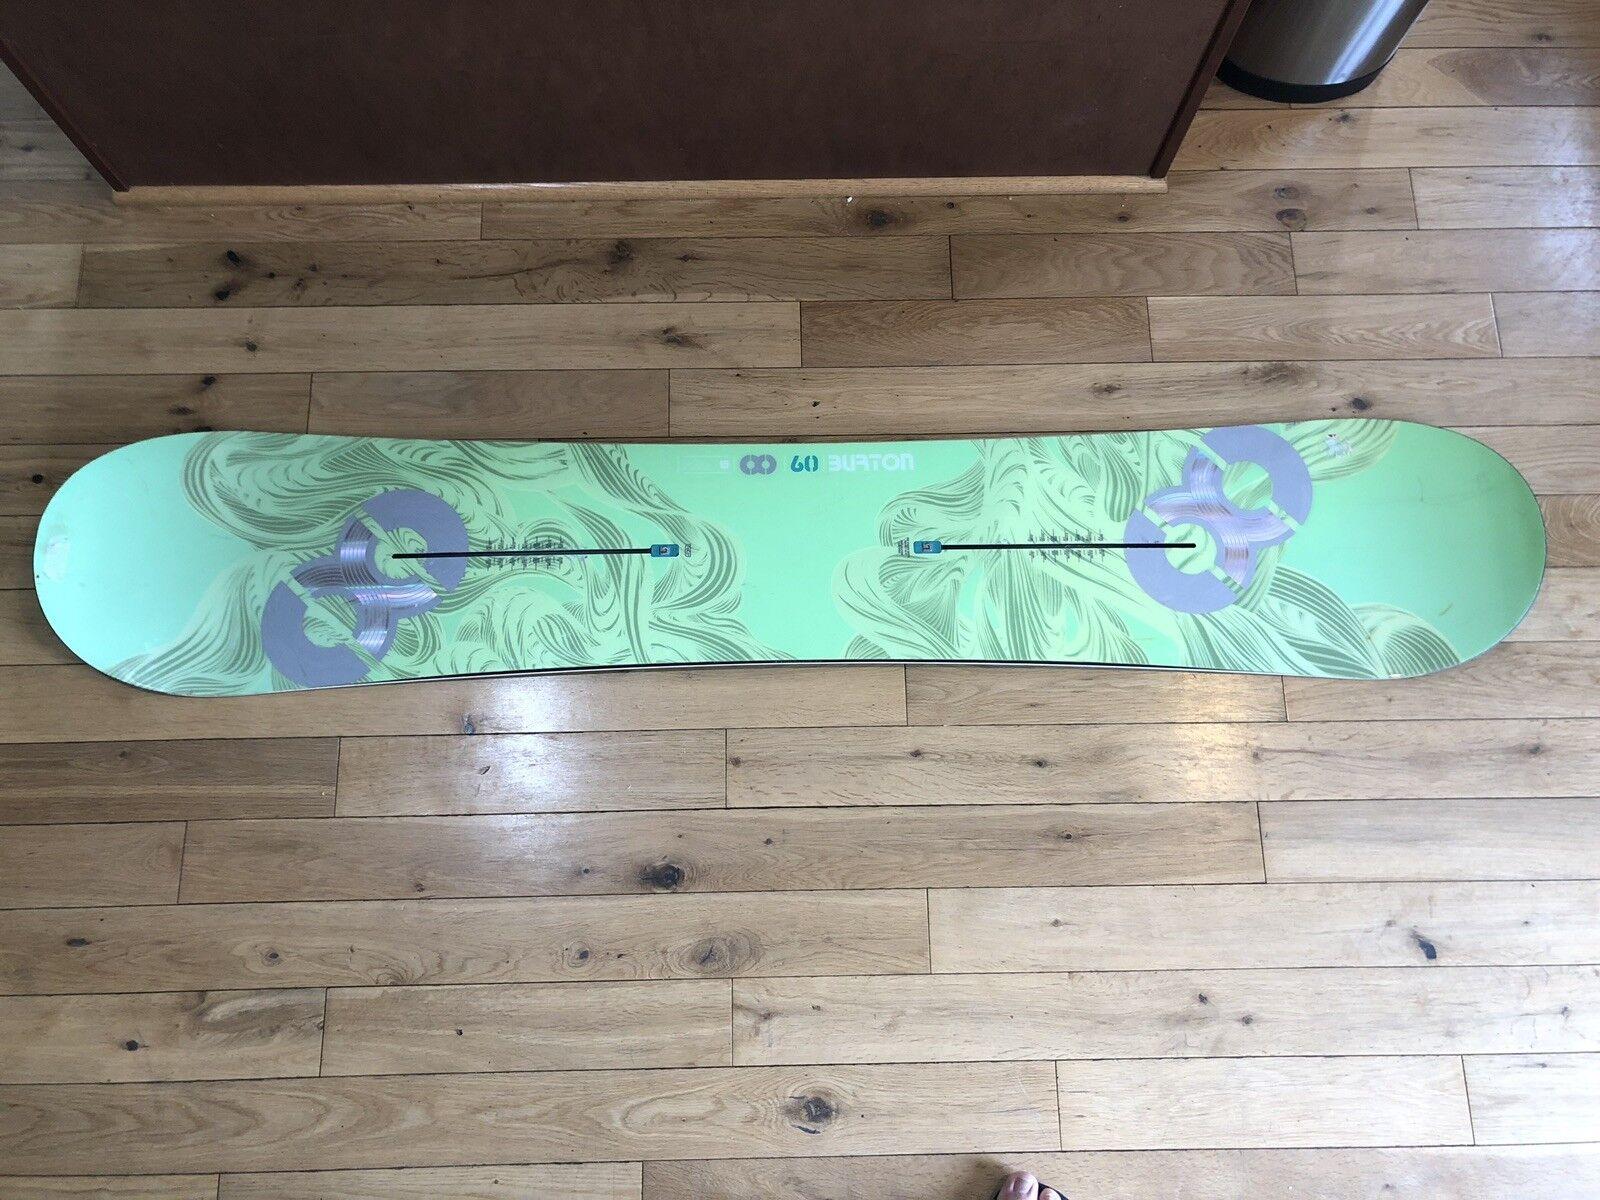 Burton X8 Channel Snowboard 160 Lime Green